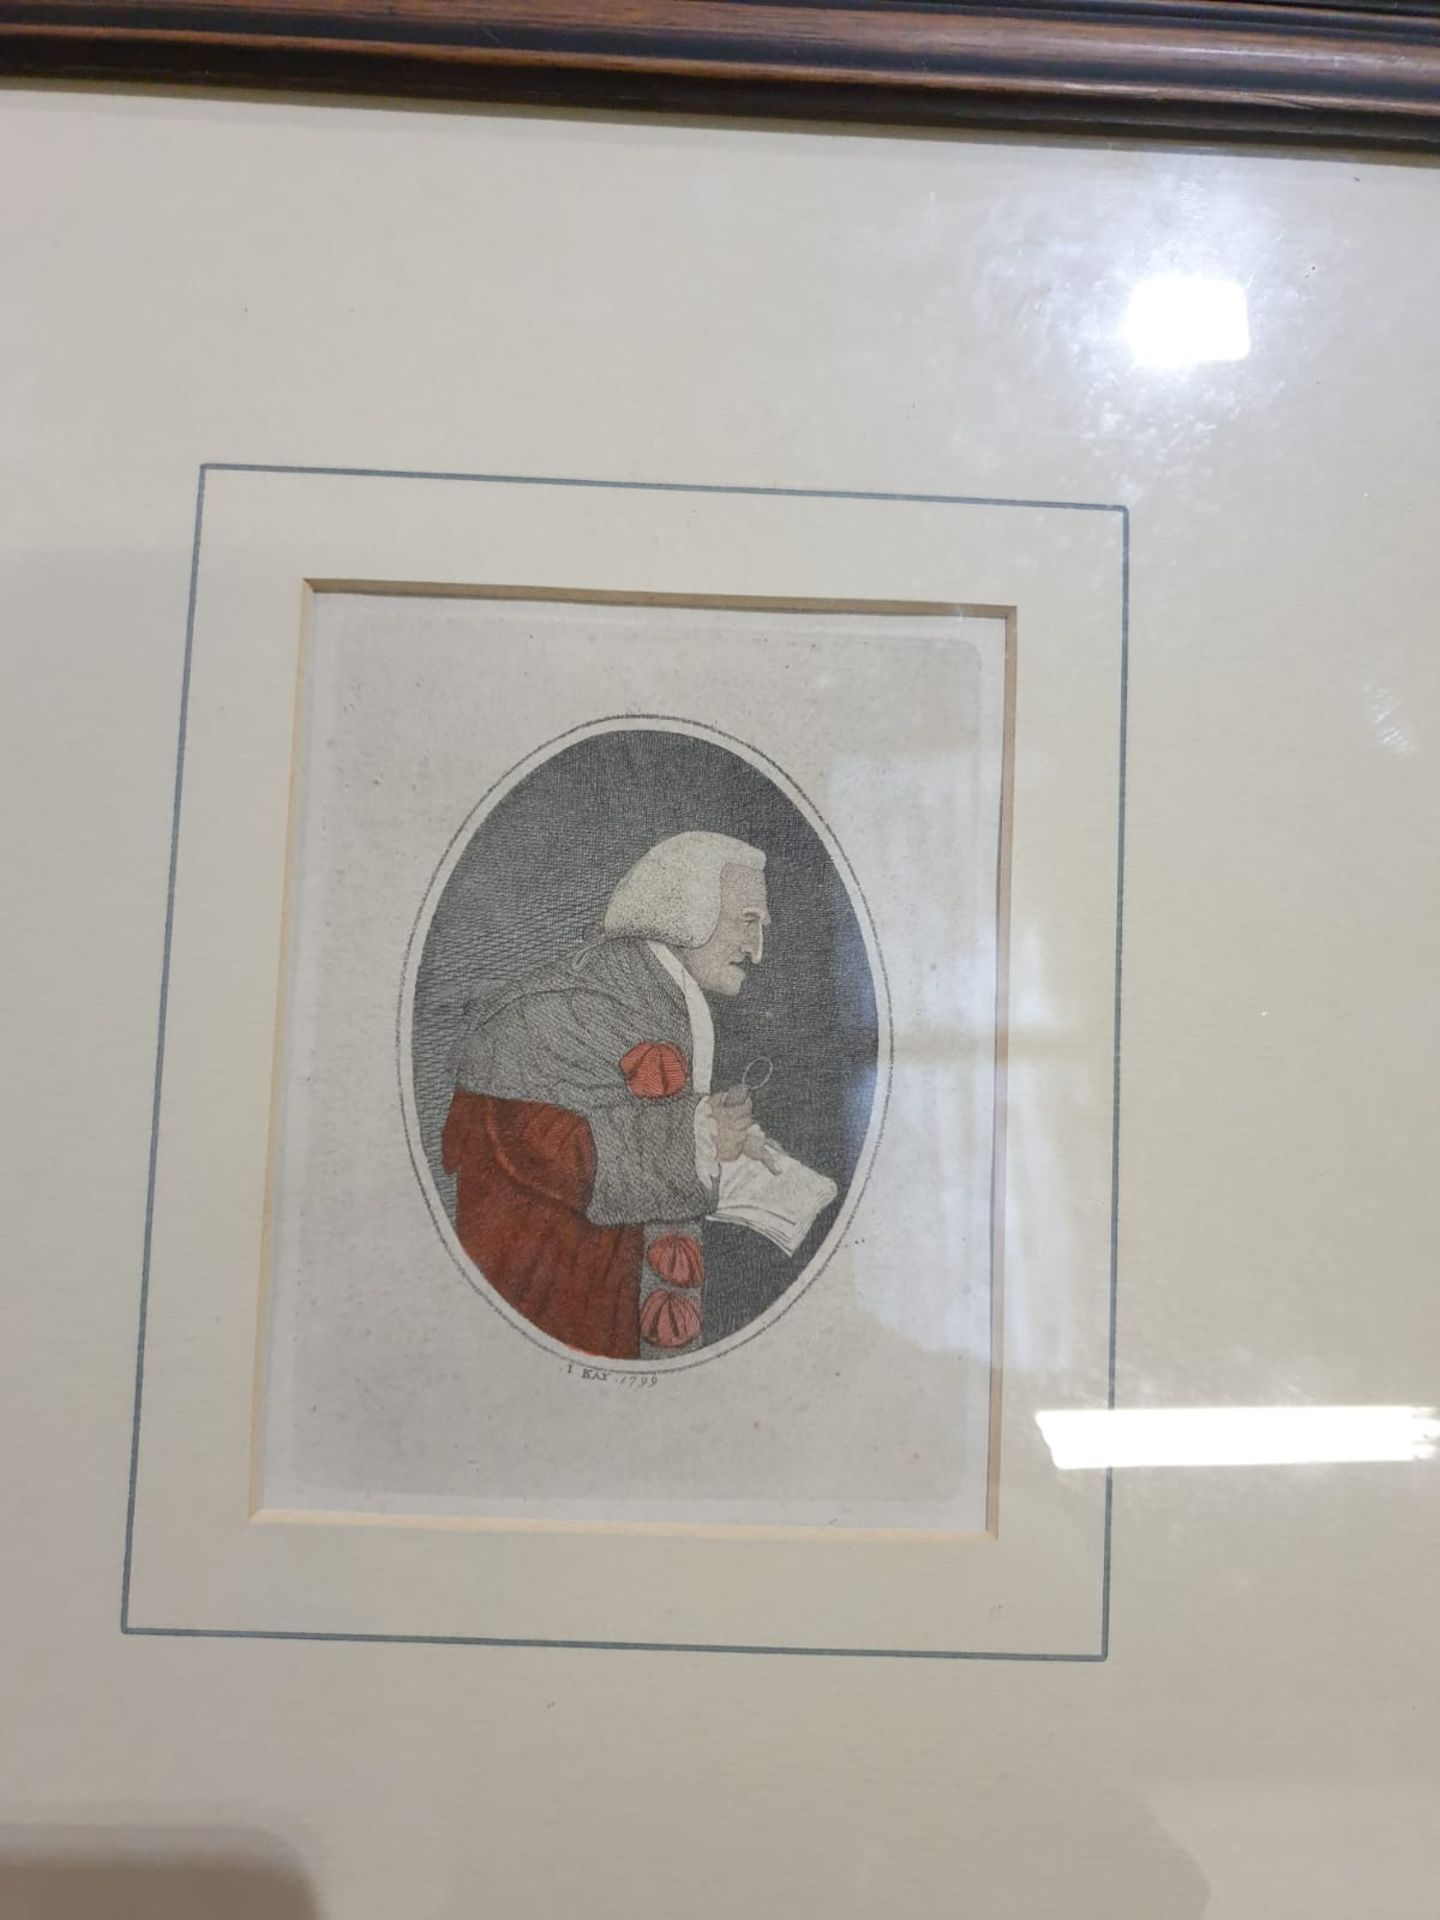 A set of 4 framed John Kay coloured prints of etchings Law gentlemen Lord Balmuto by John Kay, 1799, - Image 3 of 5